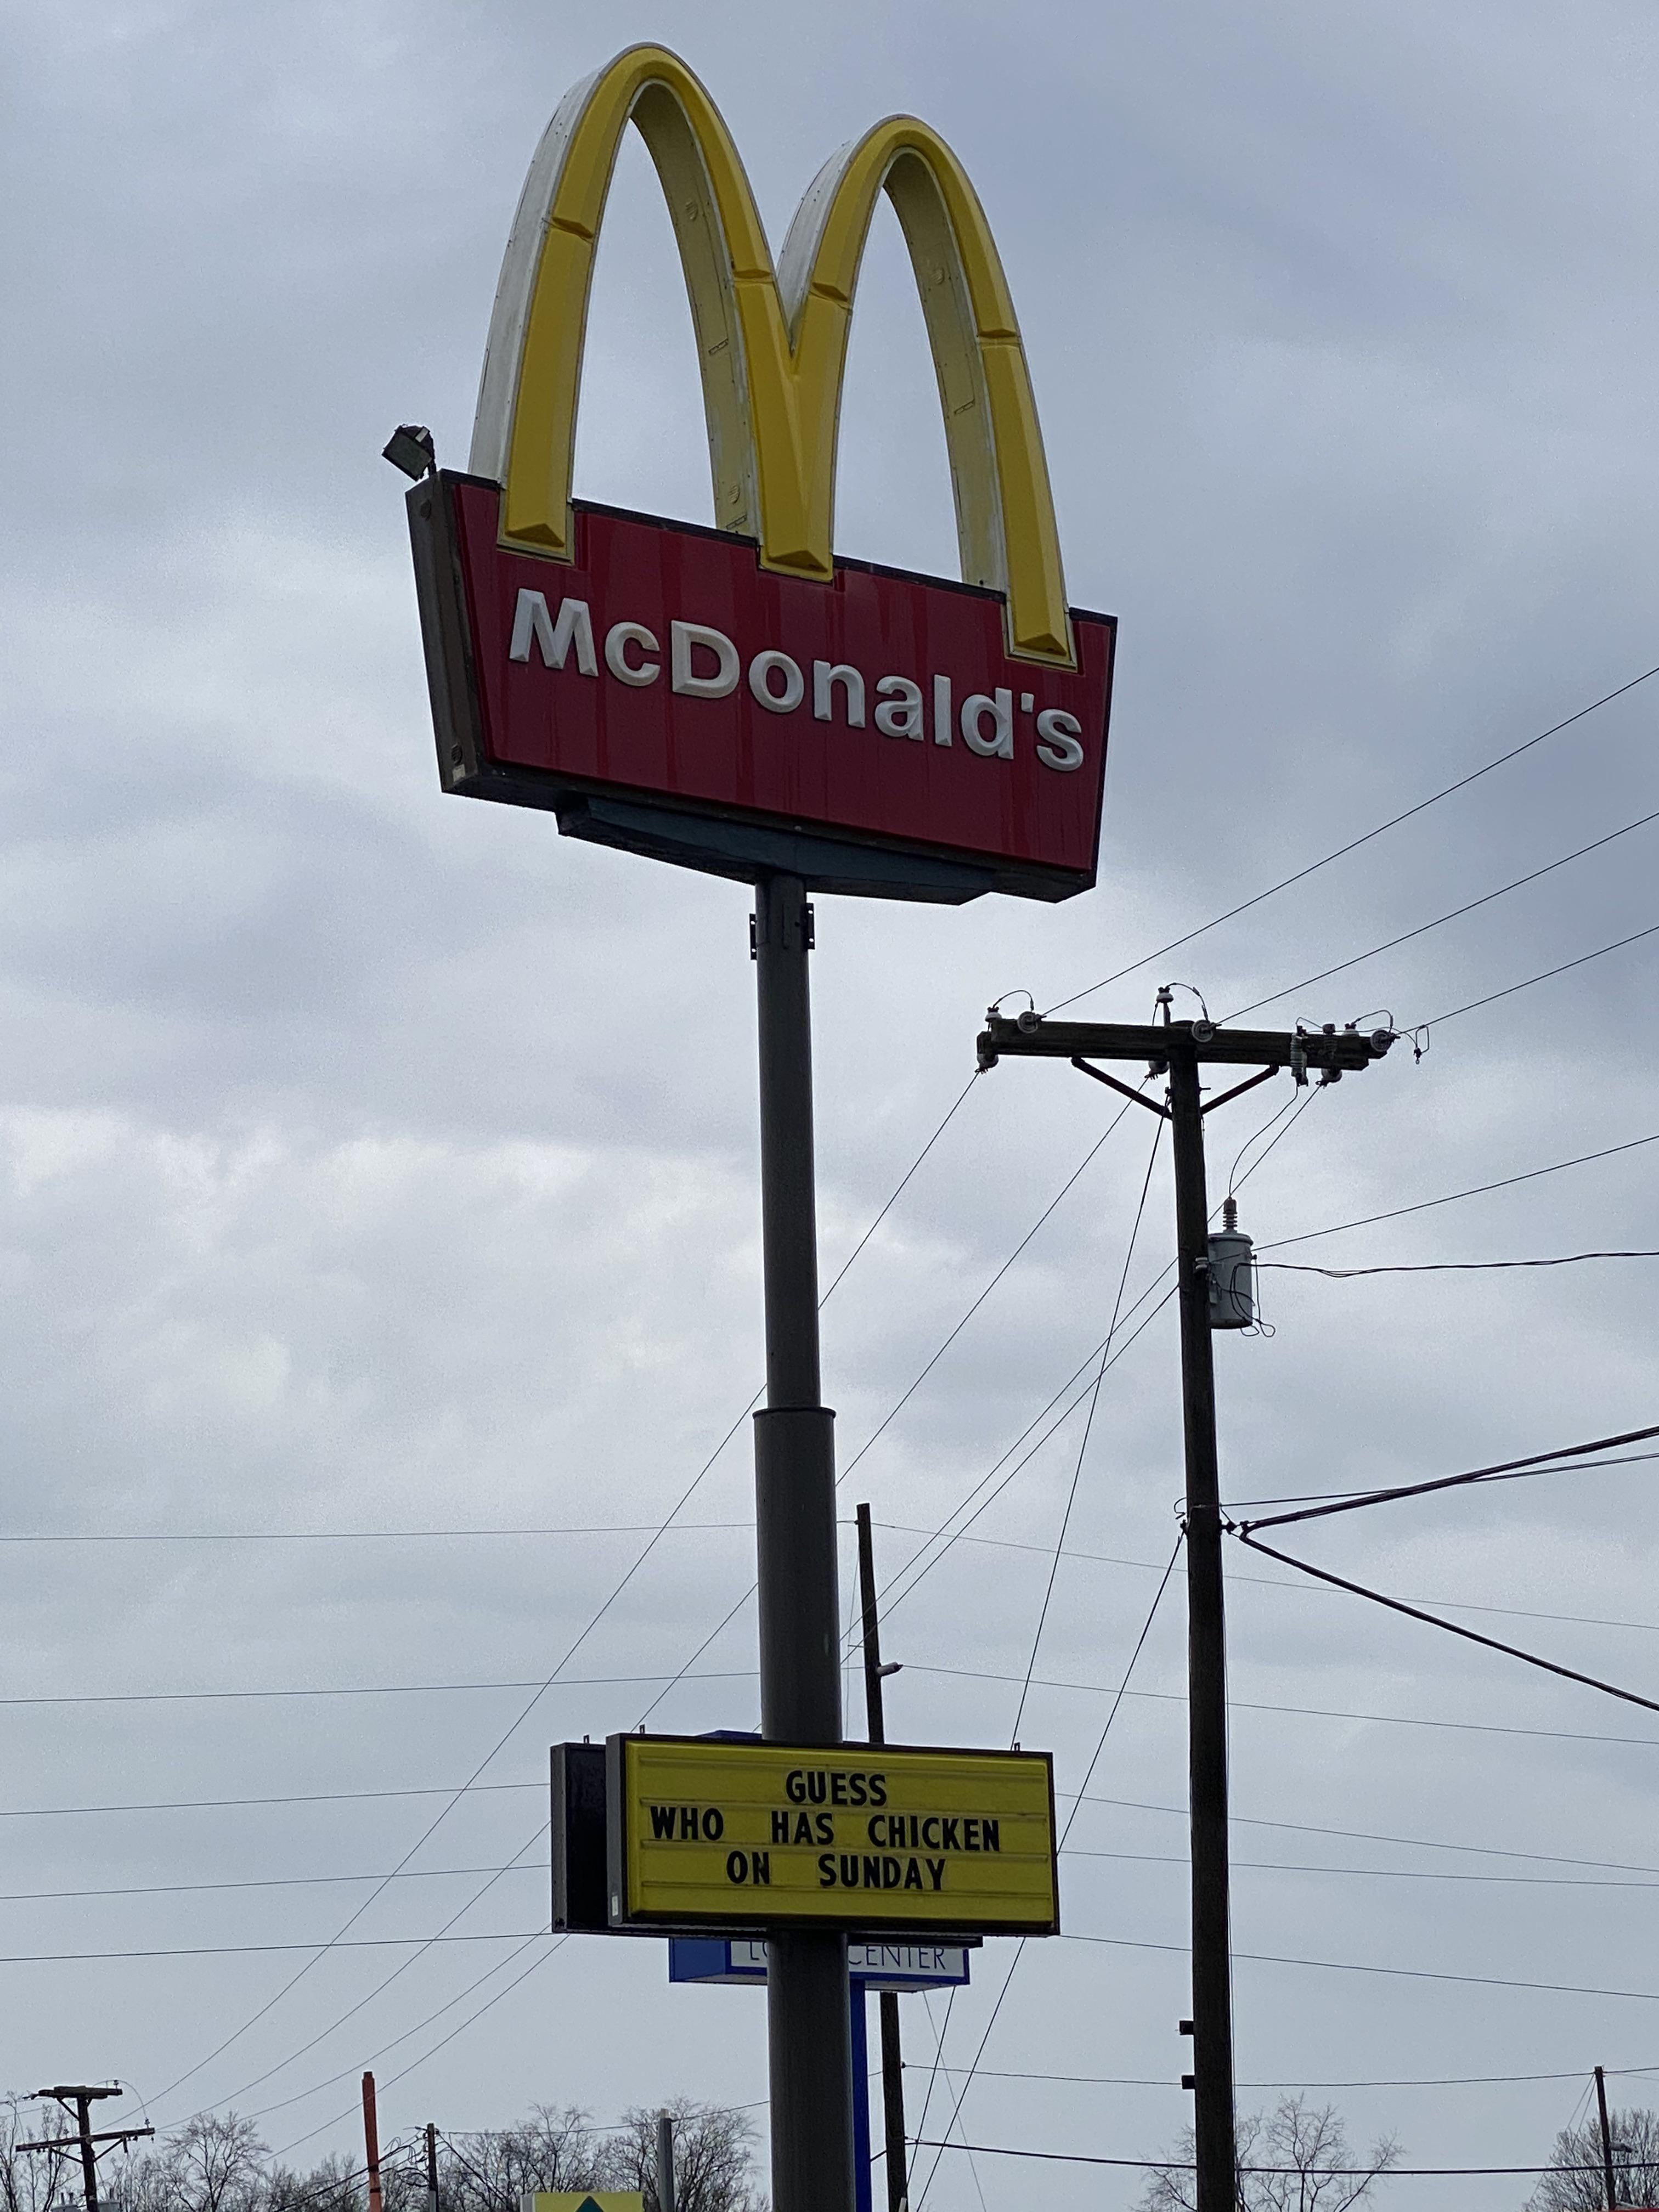 McDonald's throwing shade!